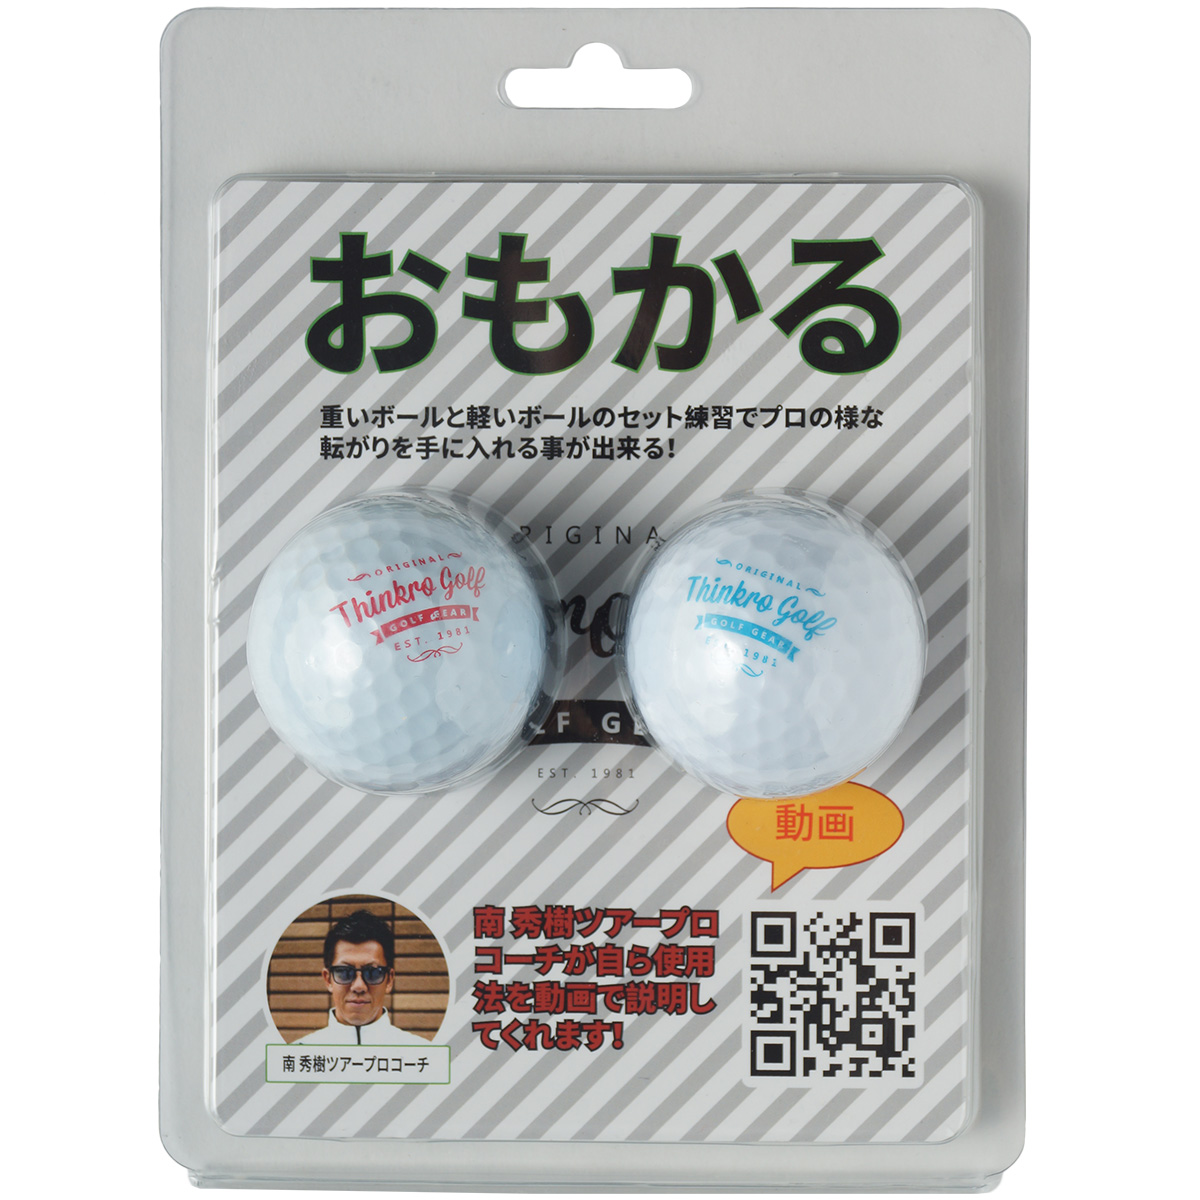 THINKRO GOLF おもかる パター専用練習ボール